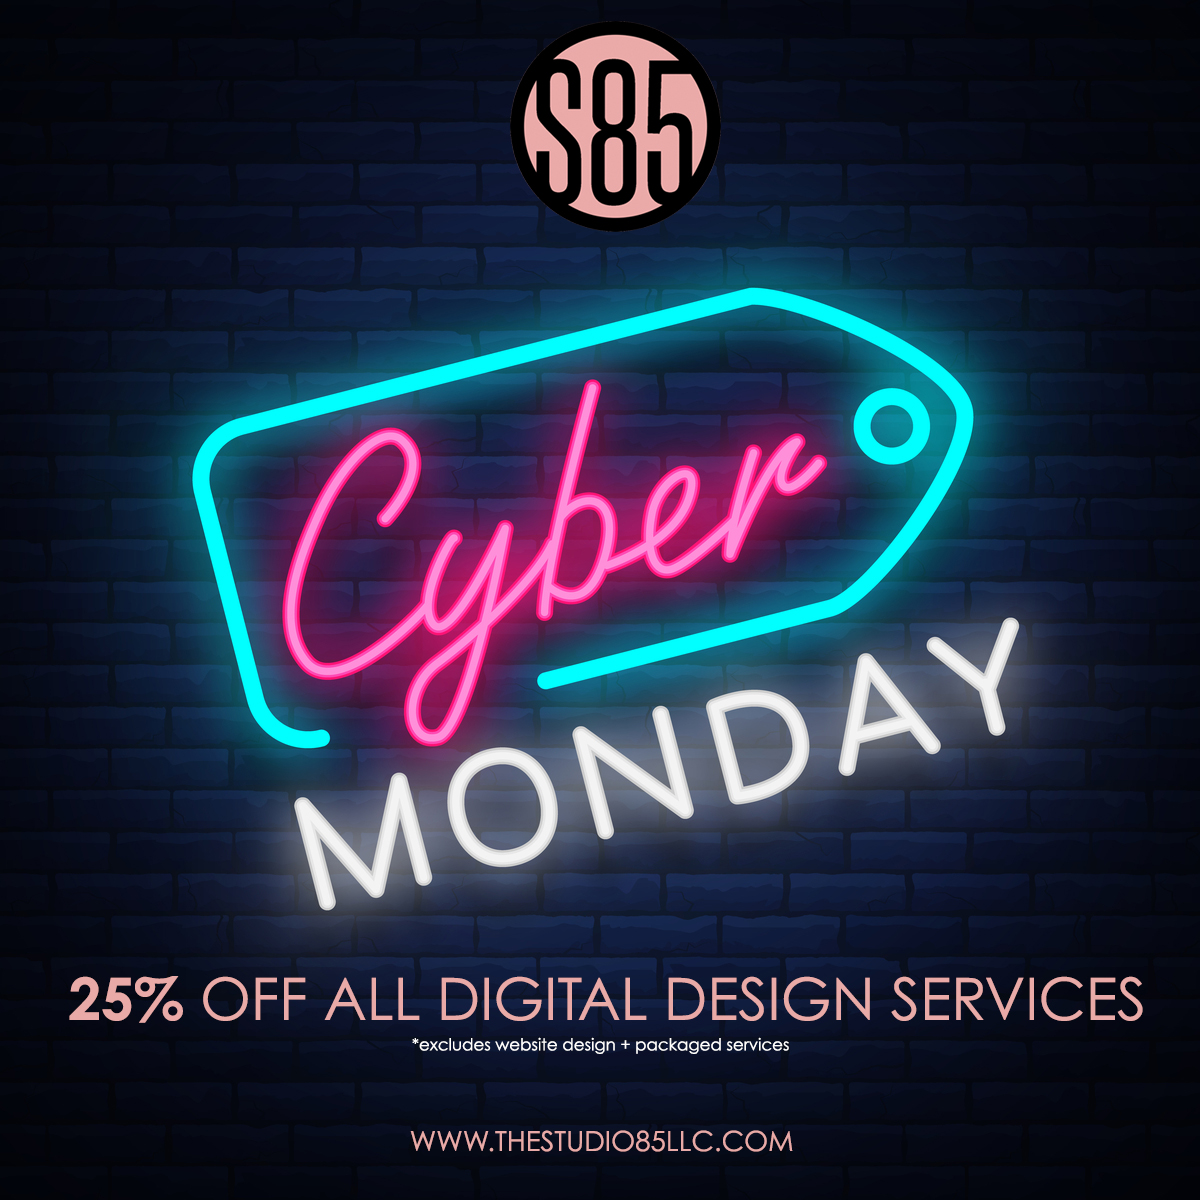 Studio 85 Cyber Monday Sale.jpg